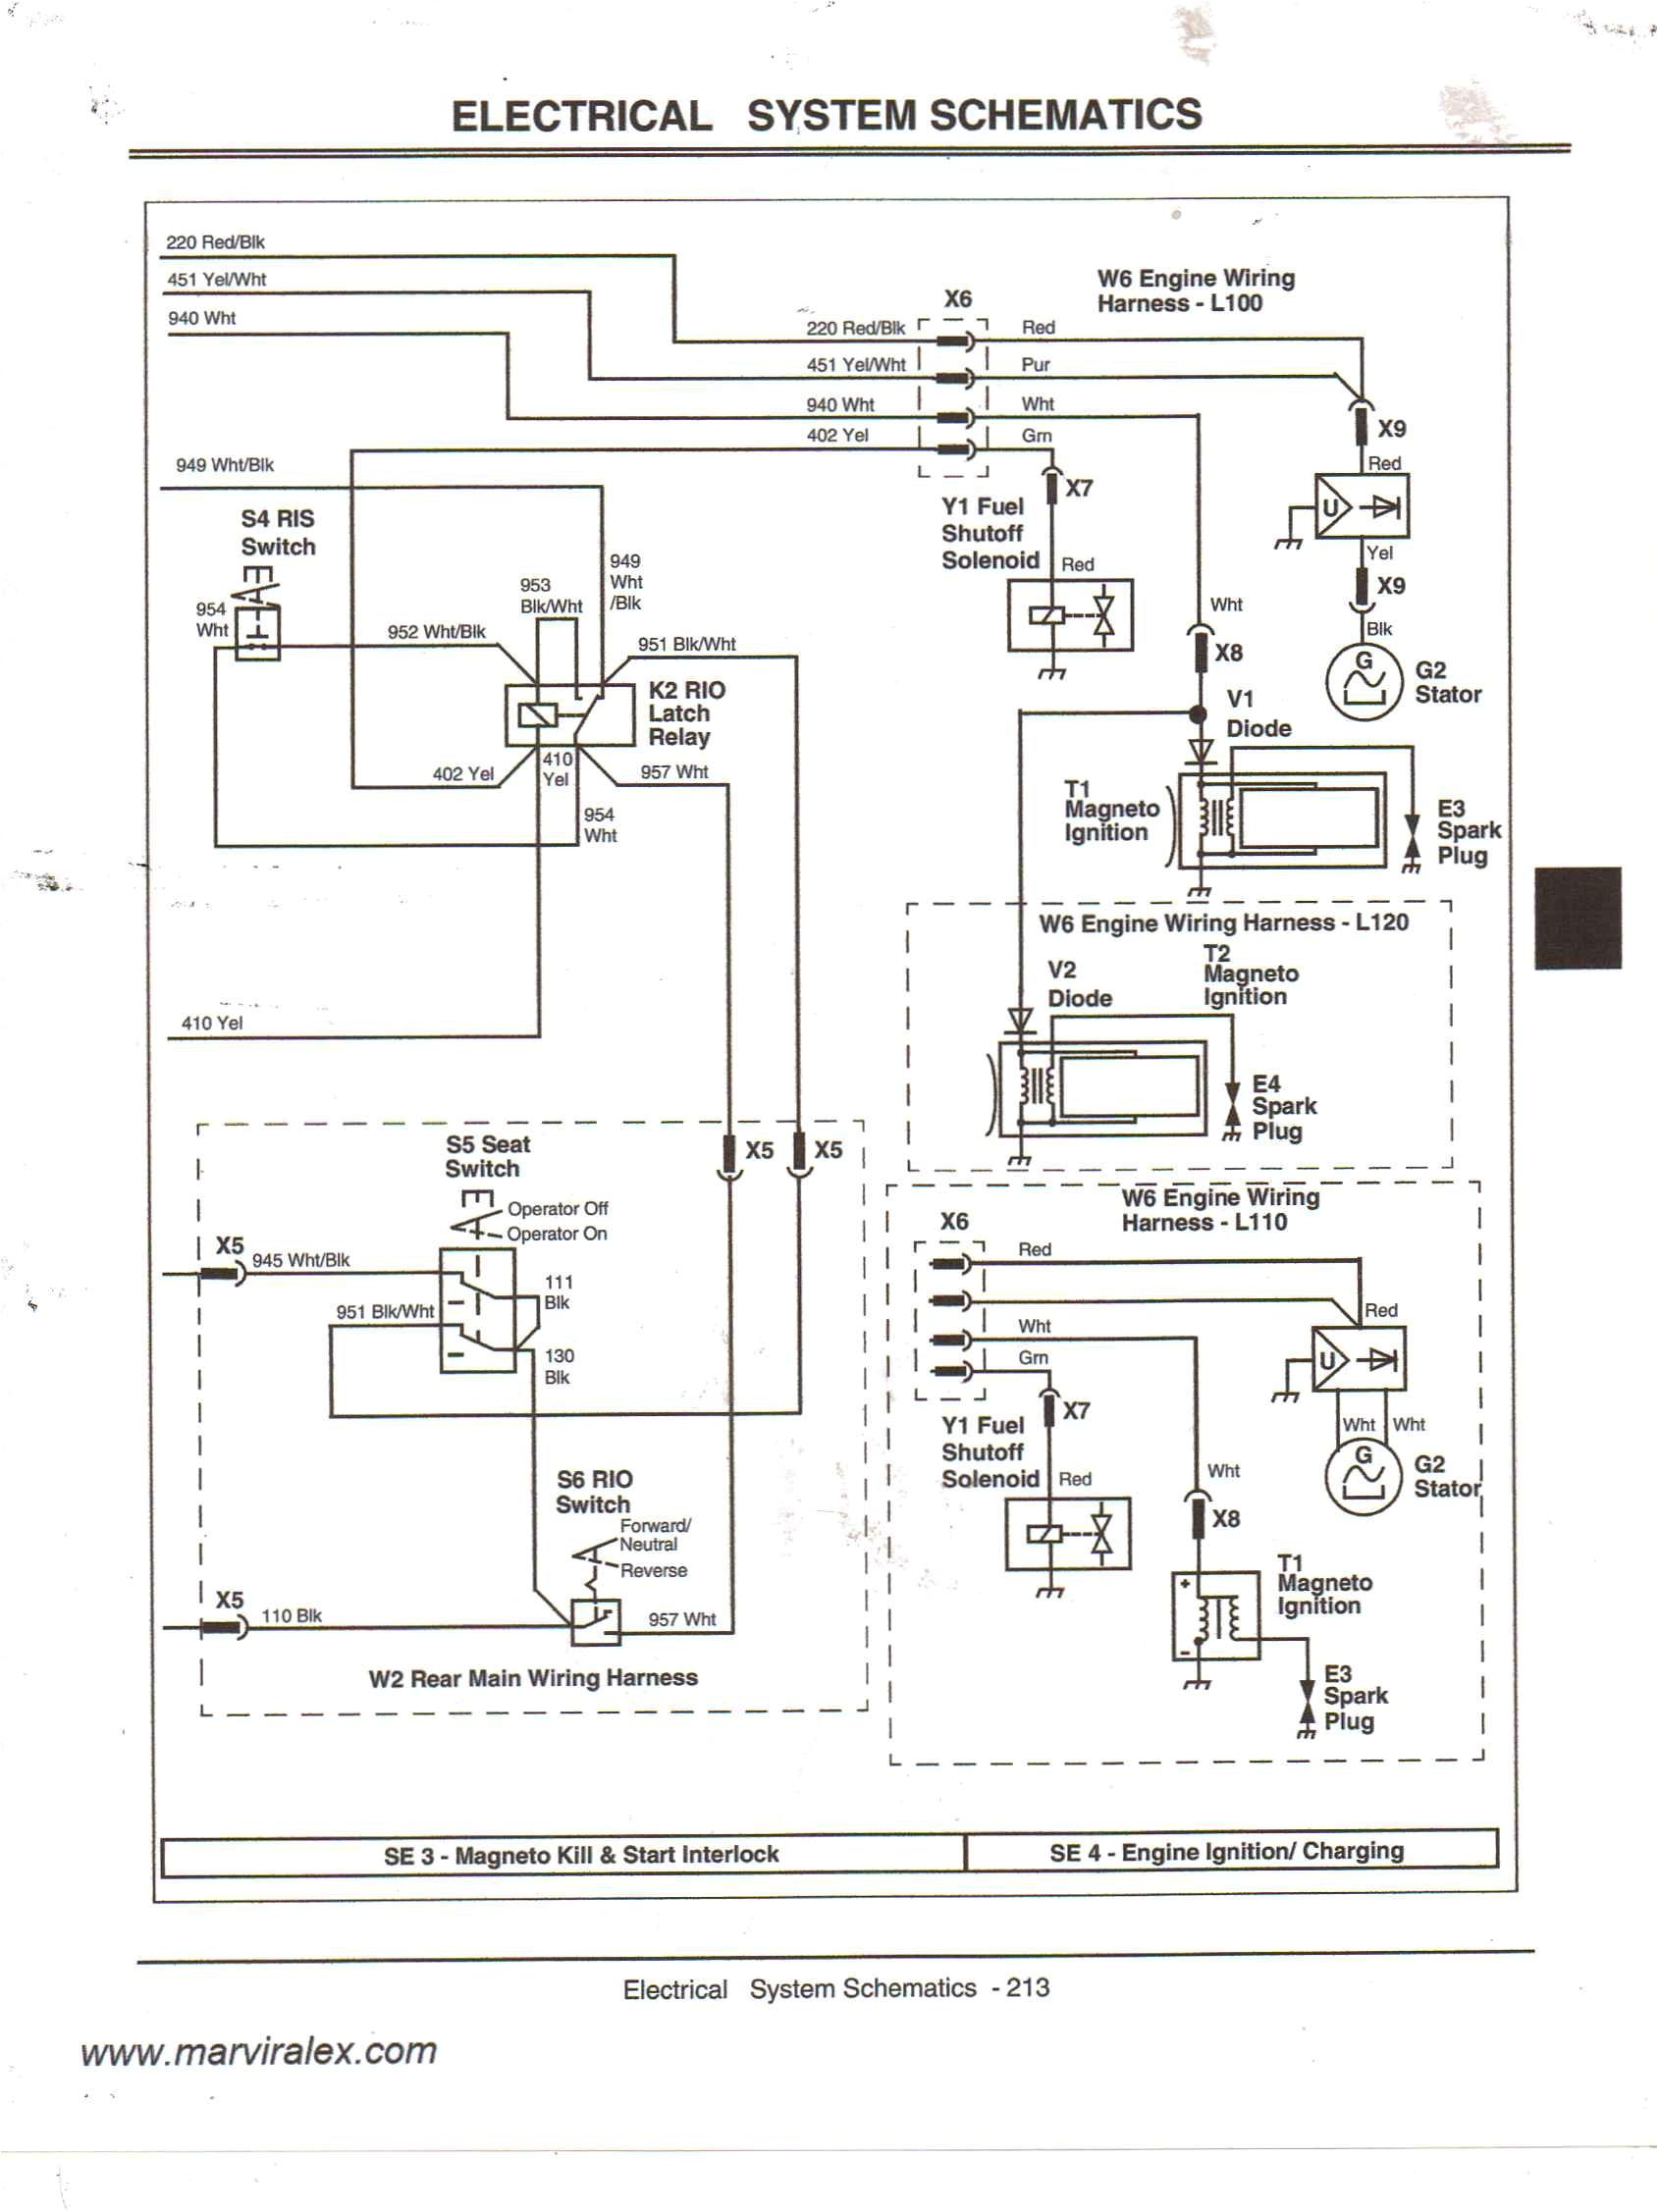 john deere 111 lawn tractor wiring diagram luxury john deere 111 lawn tractor wiring diagram zookastar